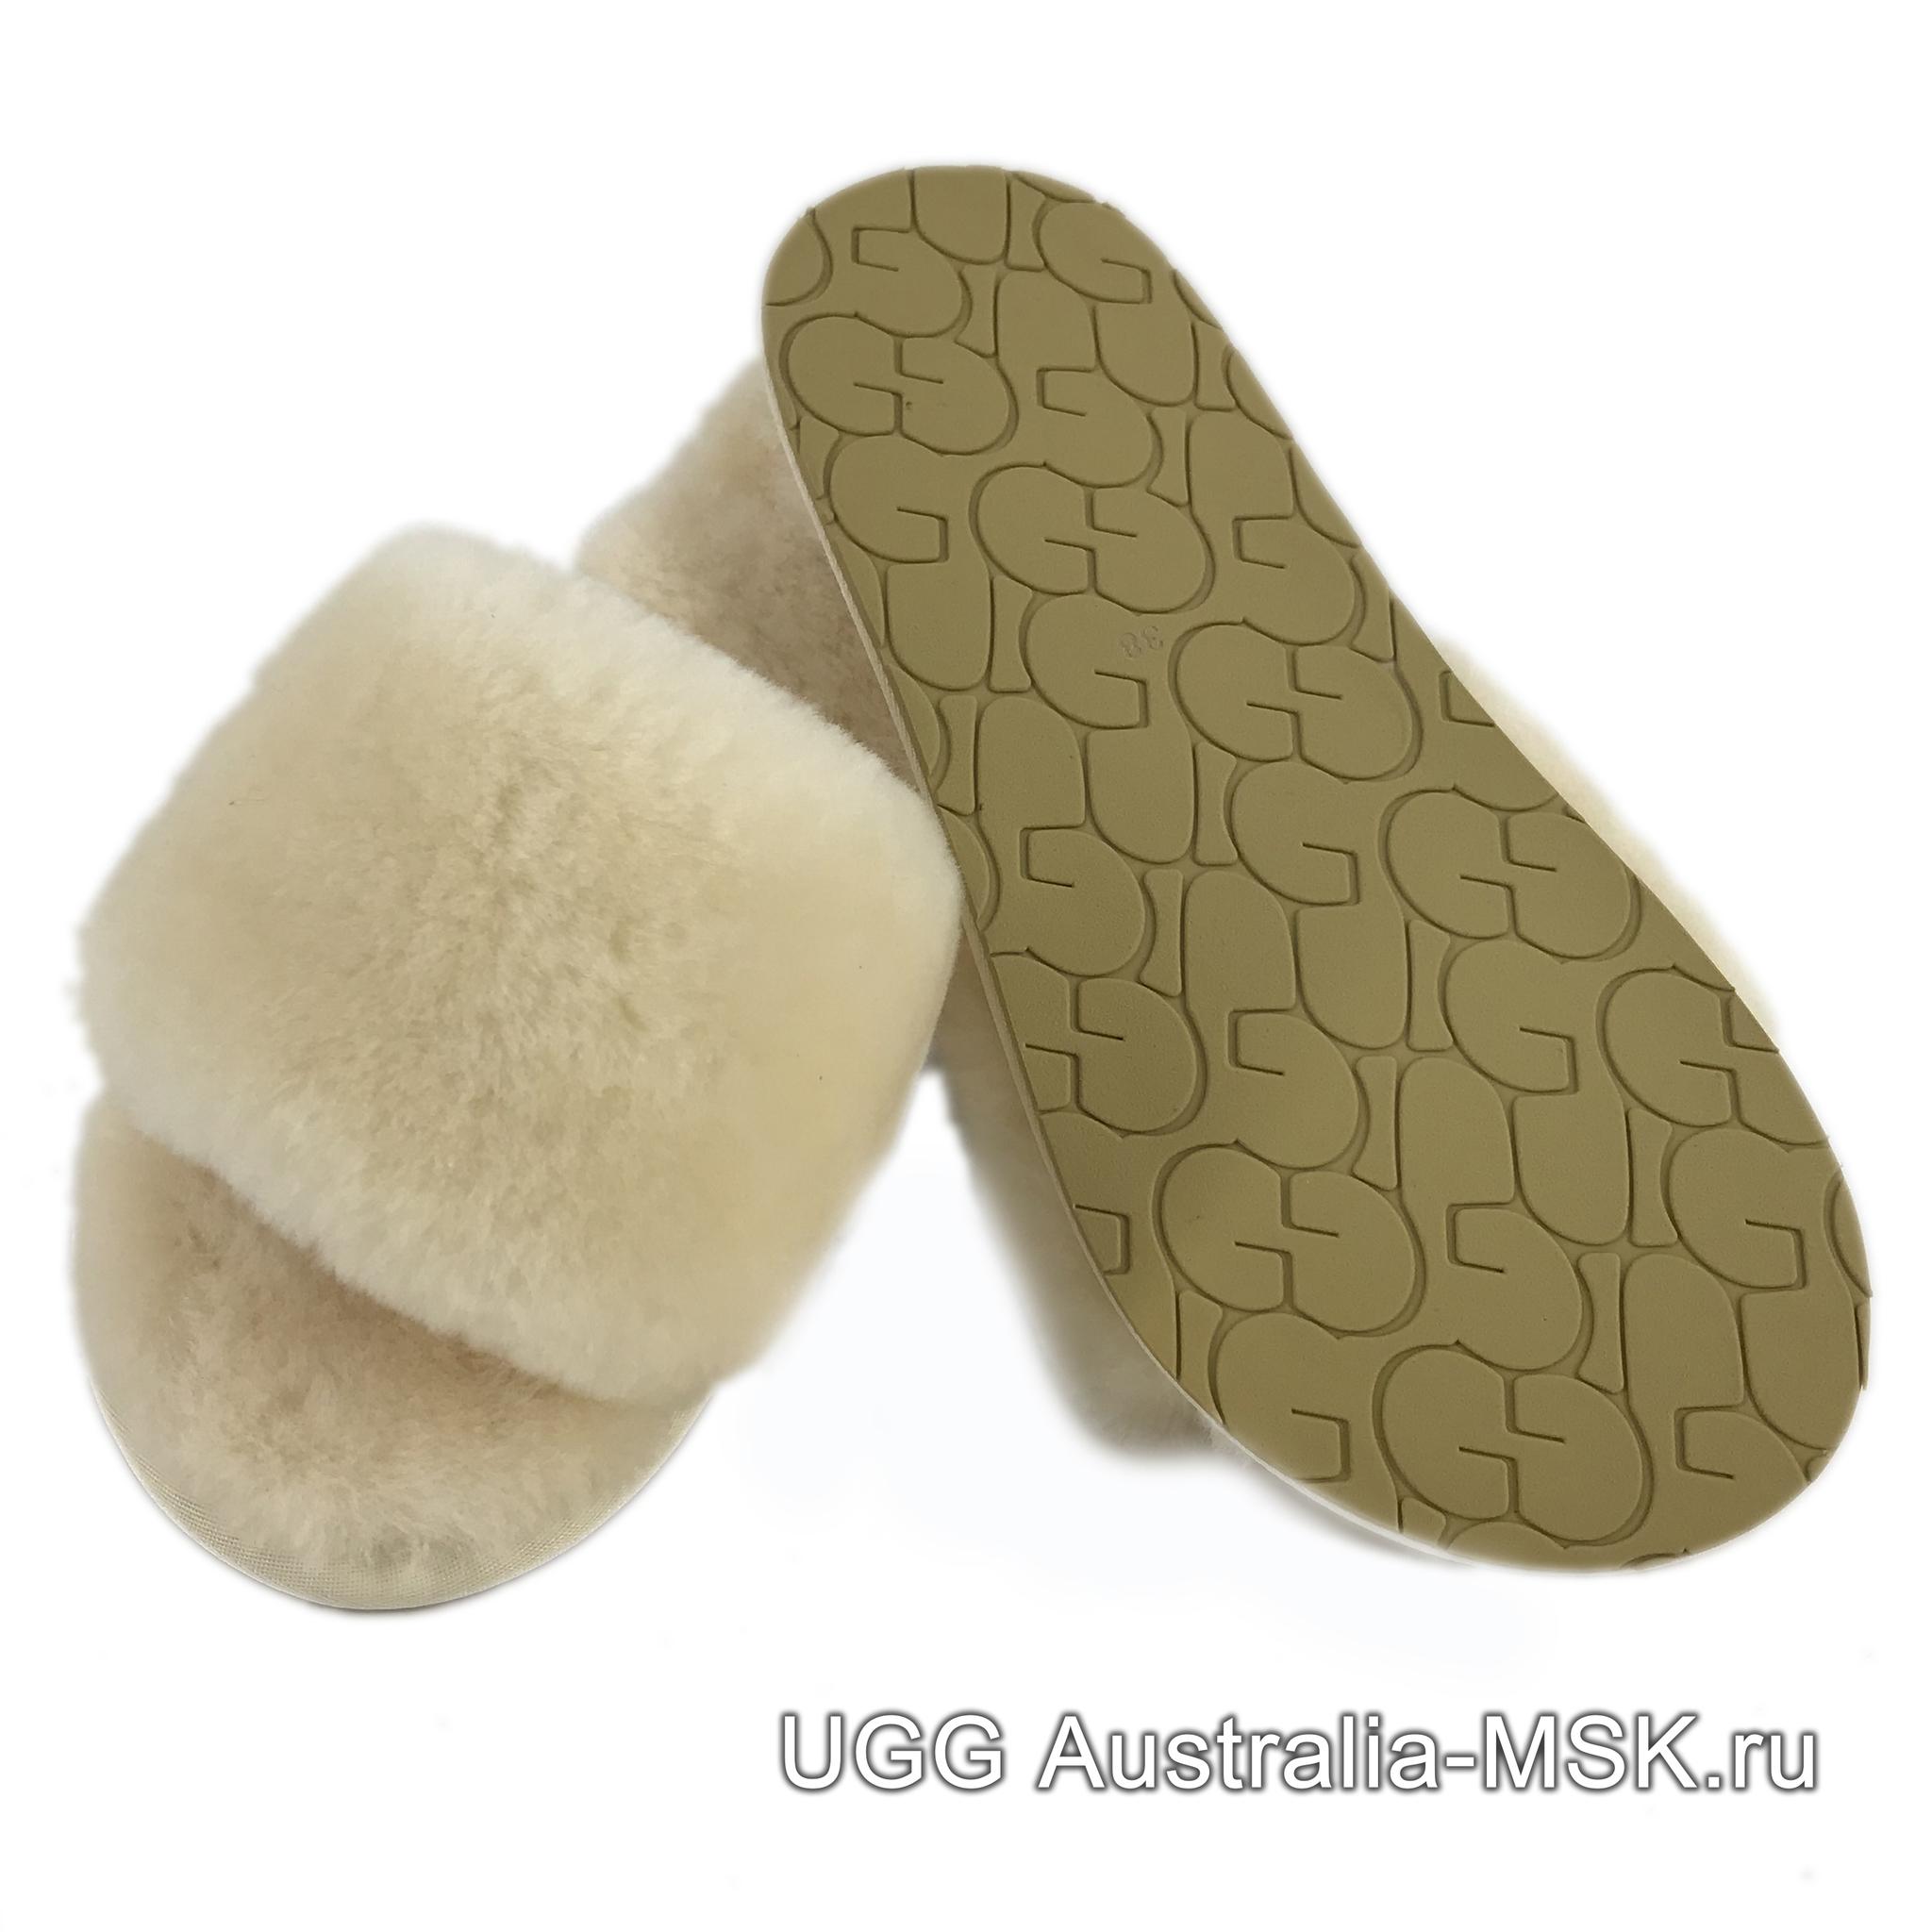 UGG Slipper Cream